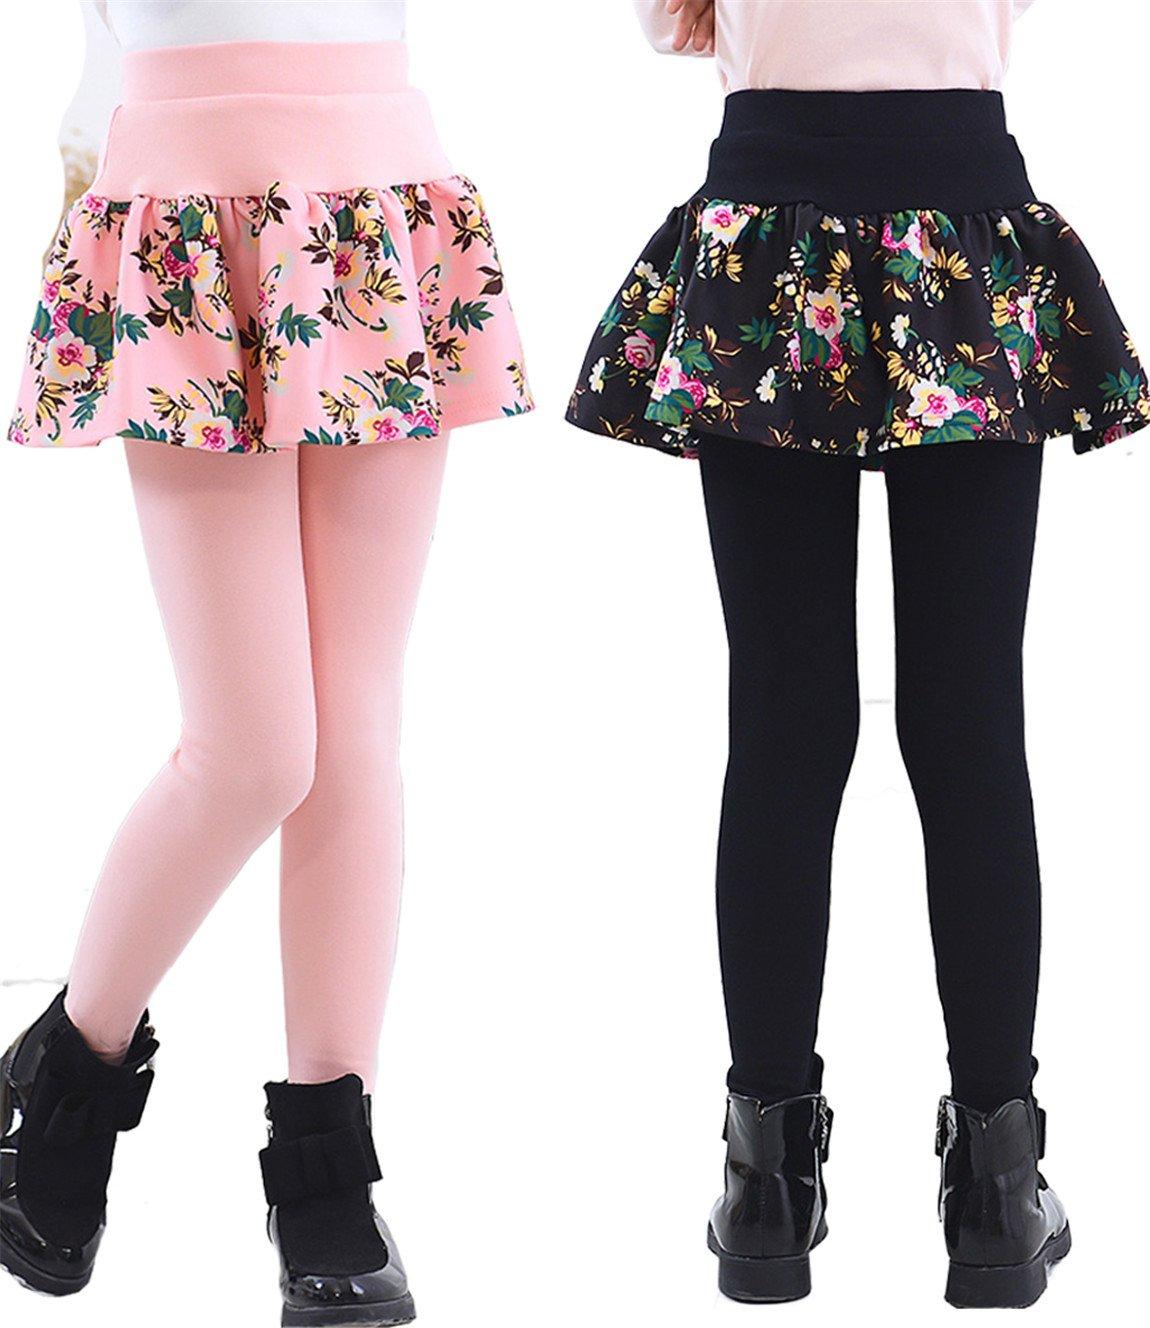 SERAIALDA Kids Girls 2 Pieces Lace Ruffle Leggings Gauze Culottes Tutu Skirt Leggings Pants 8-9 Years(Tag Size 140)